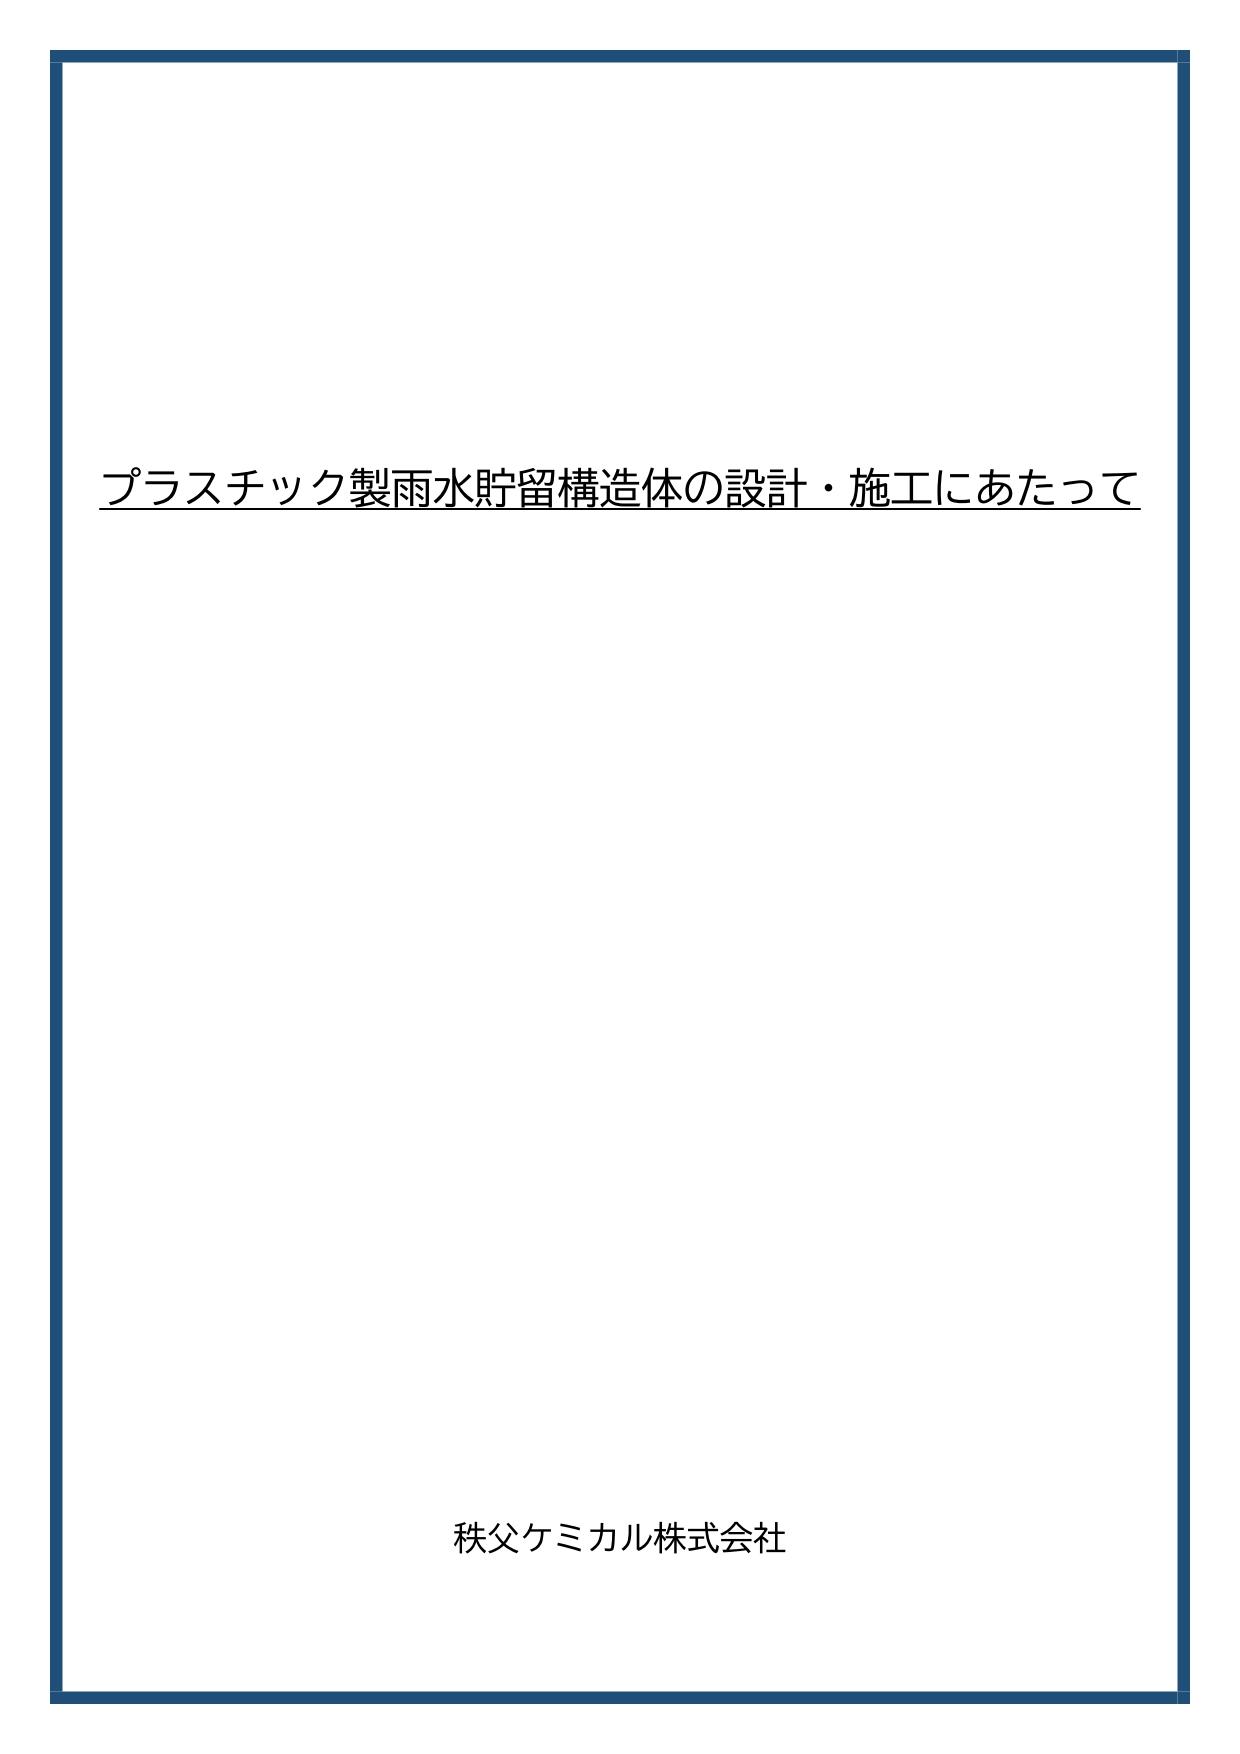 (表紙)instructions.jpg